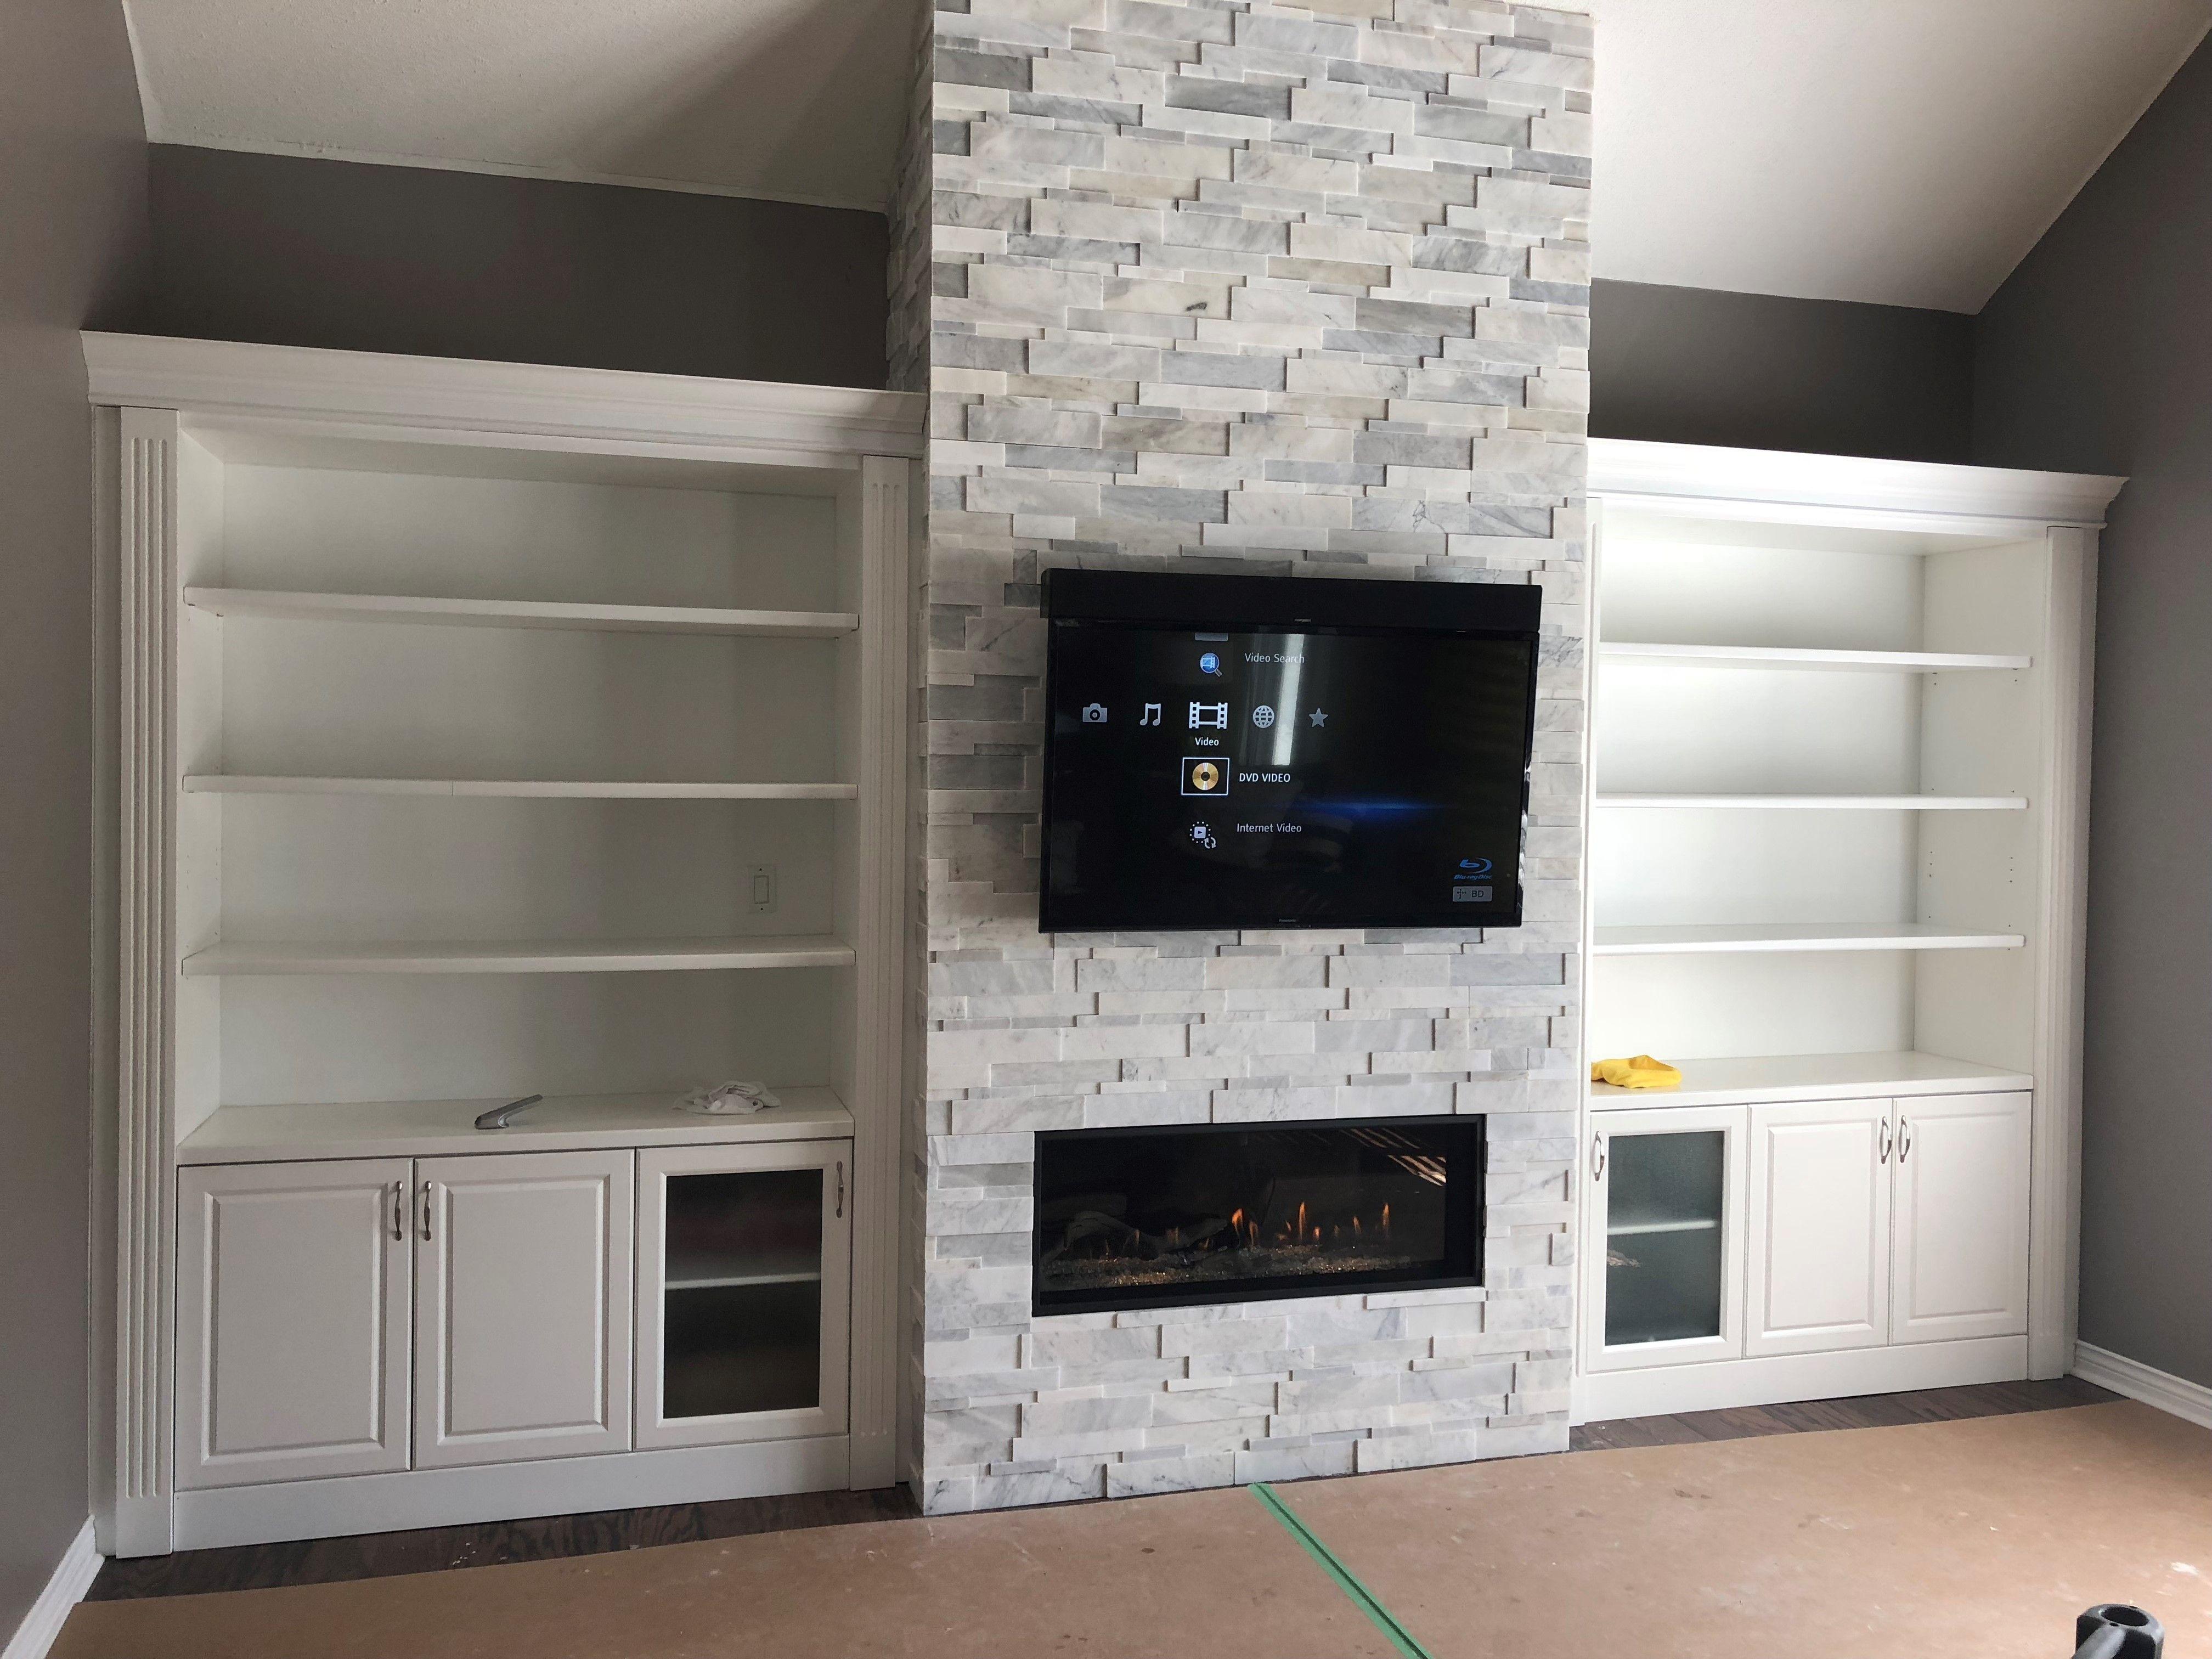 Fireplace Projects Fireplace, Reface fireplace